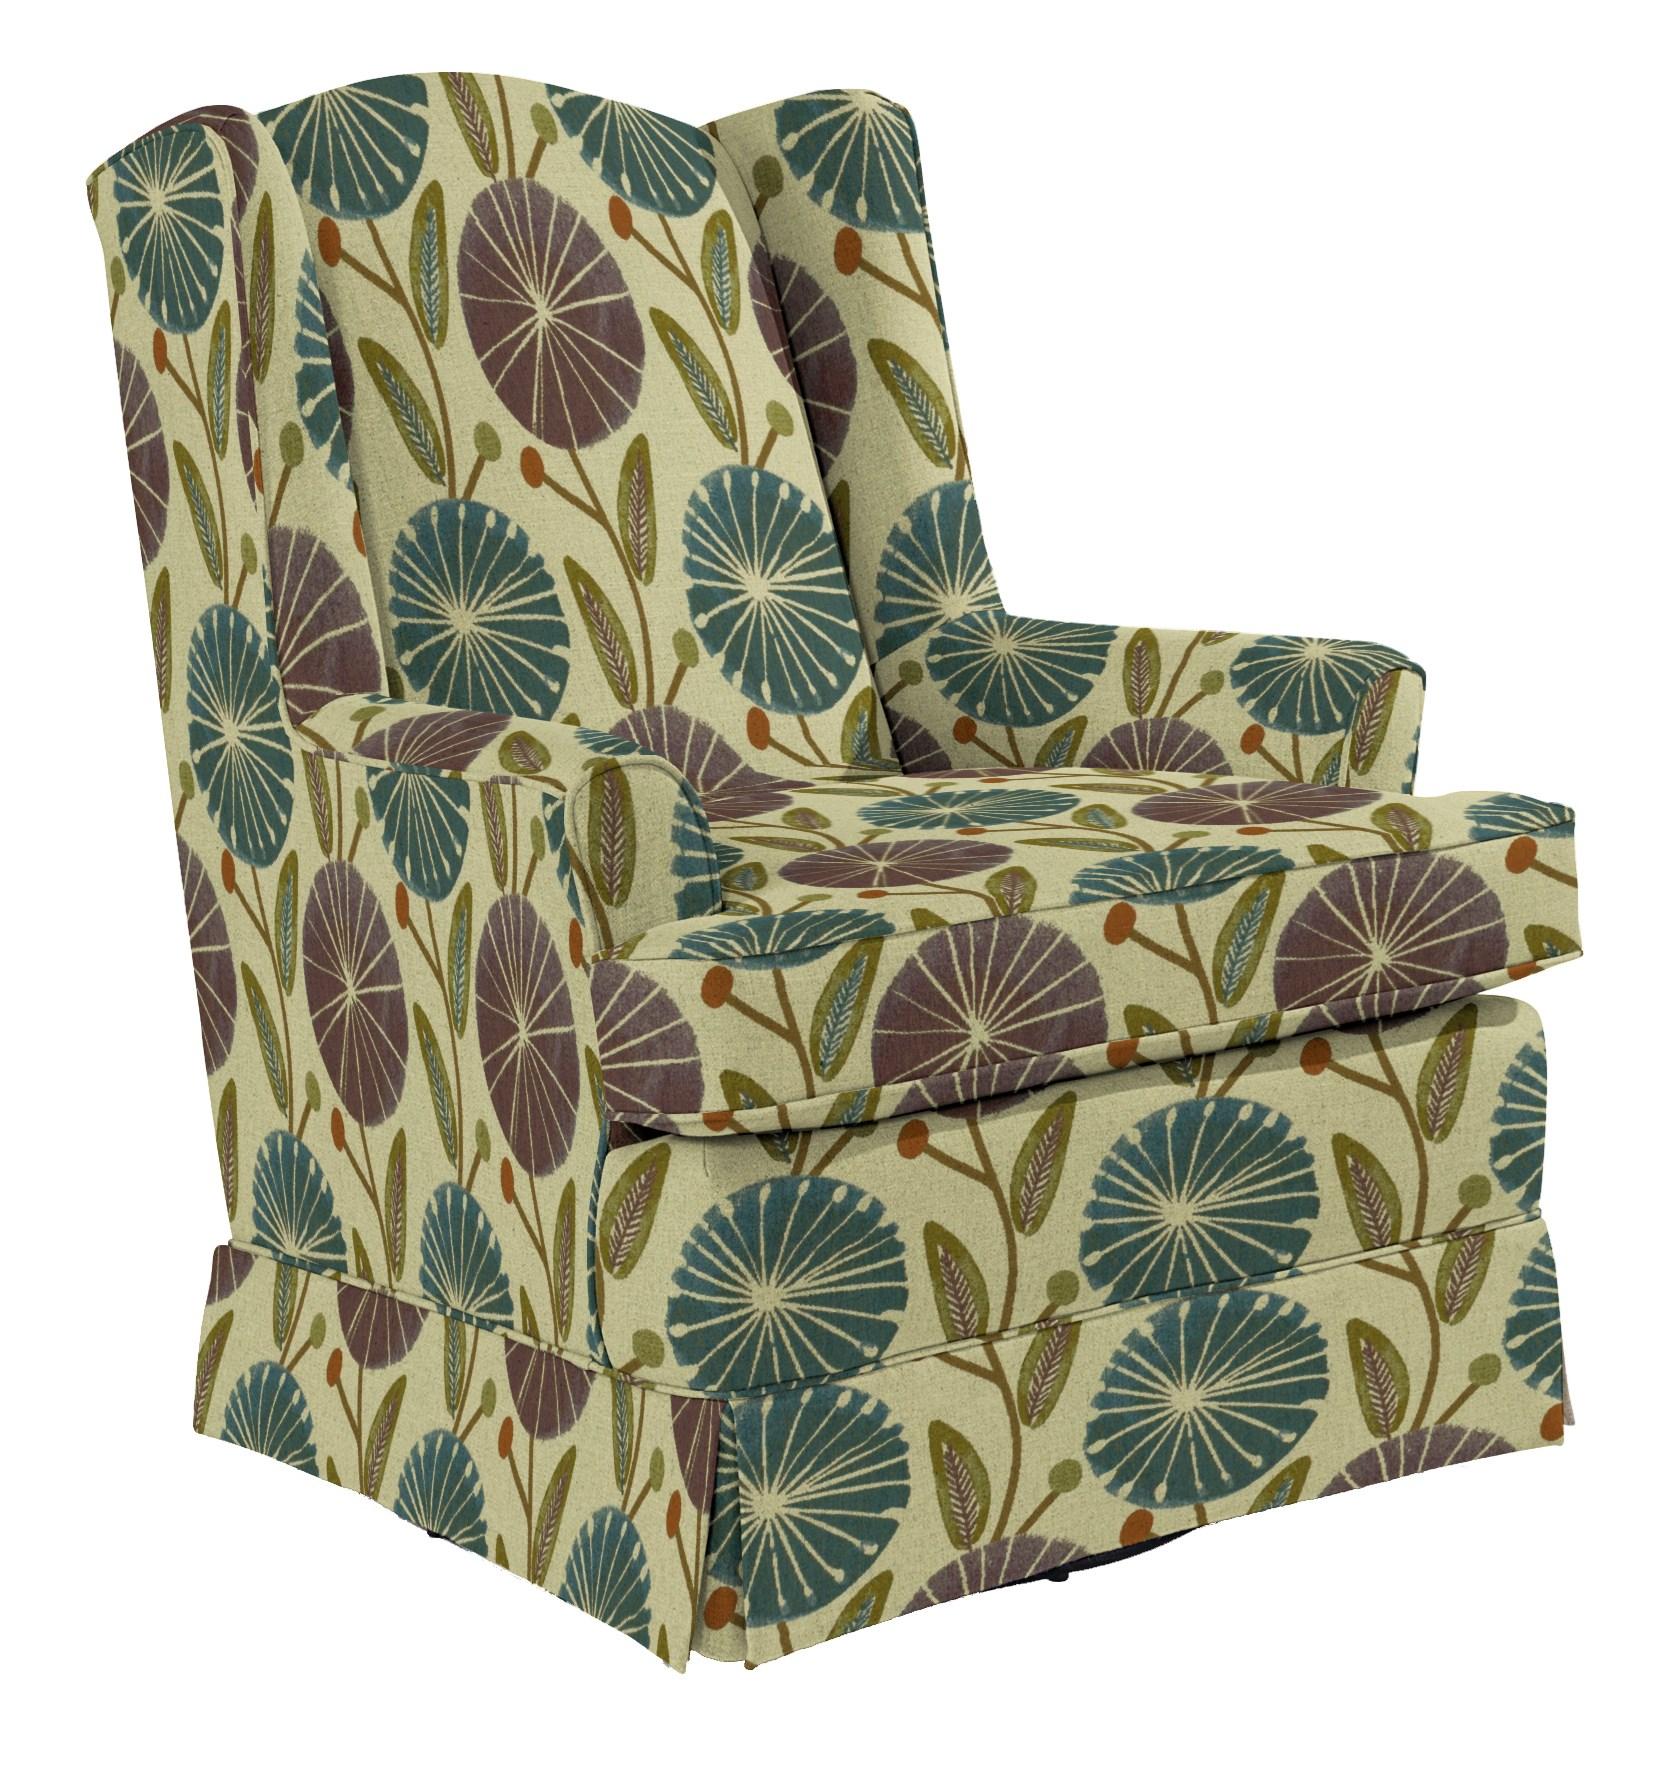 Best Home Furnishings Chairs - Swivel Glide Natasha Swivel Glider - Item Number: 7147-31747